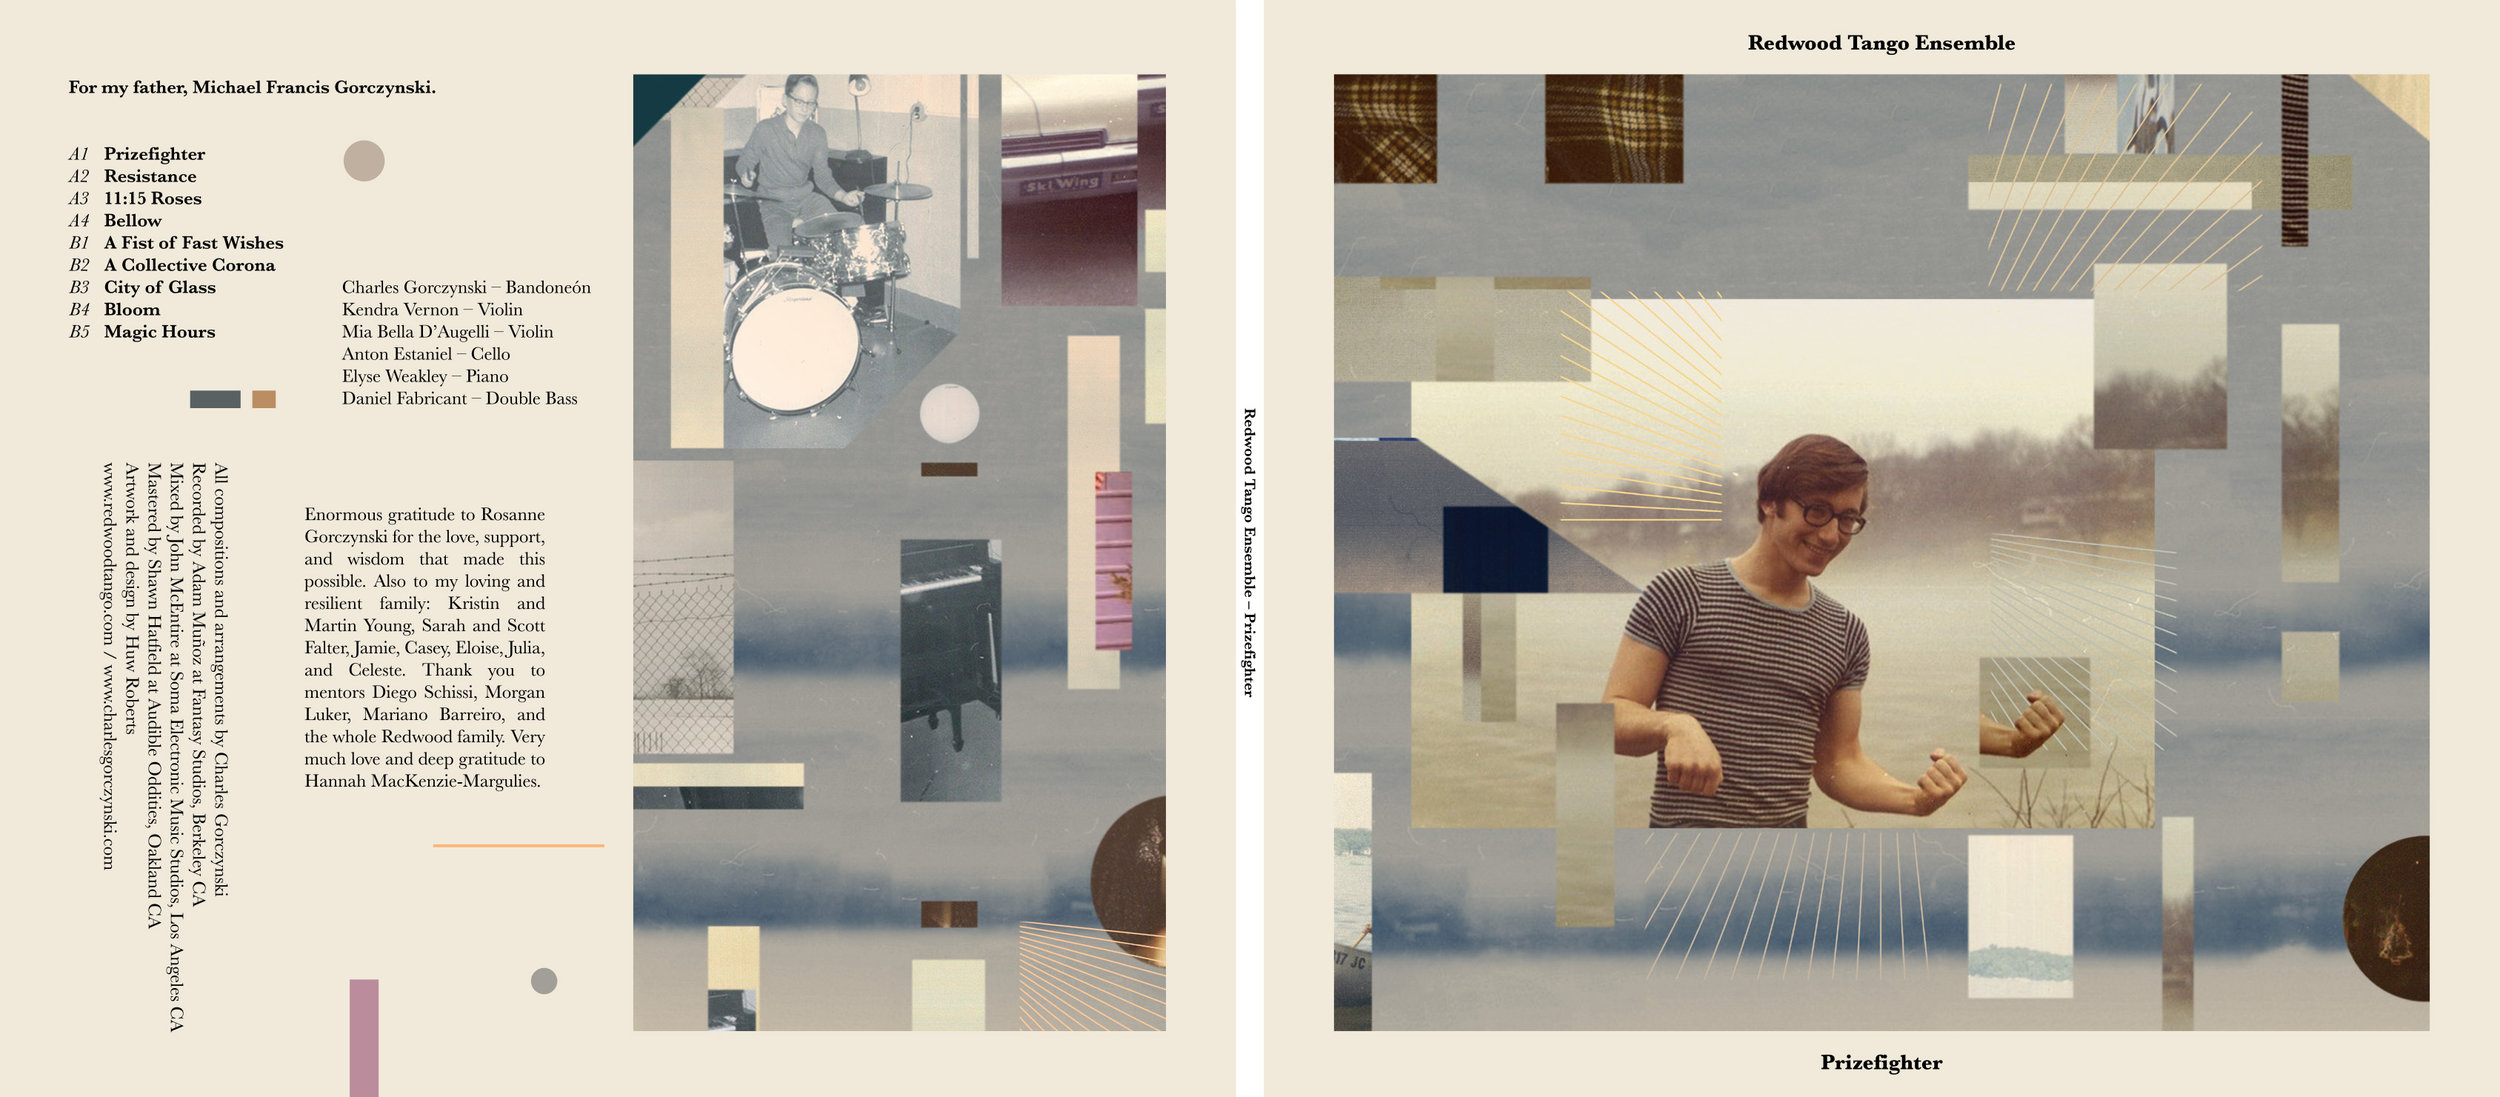 rte-cd-sleeve-preview-2017-12-07-1.jpg